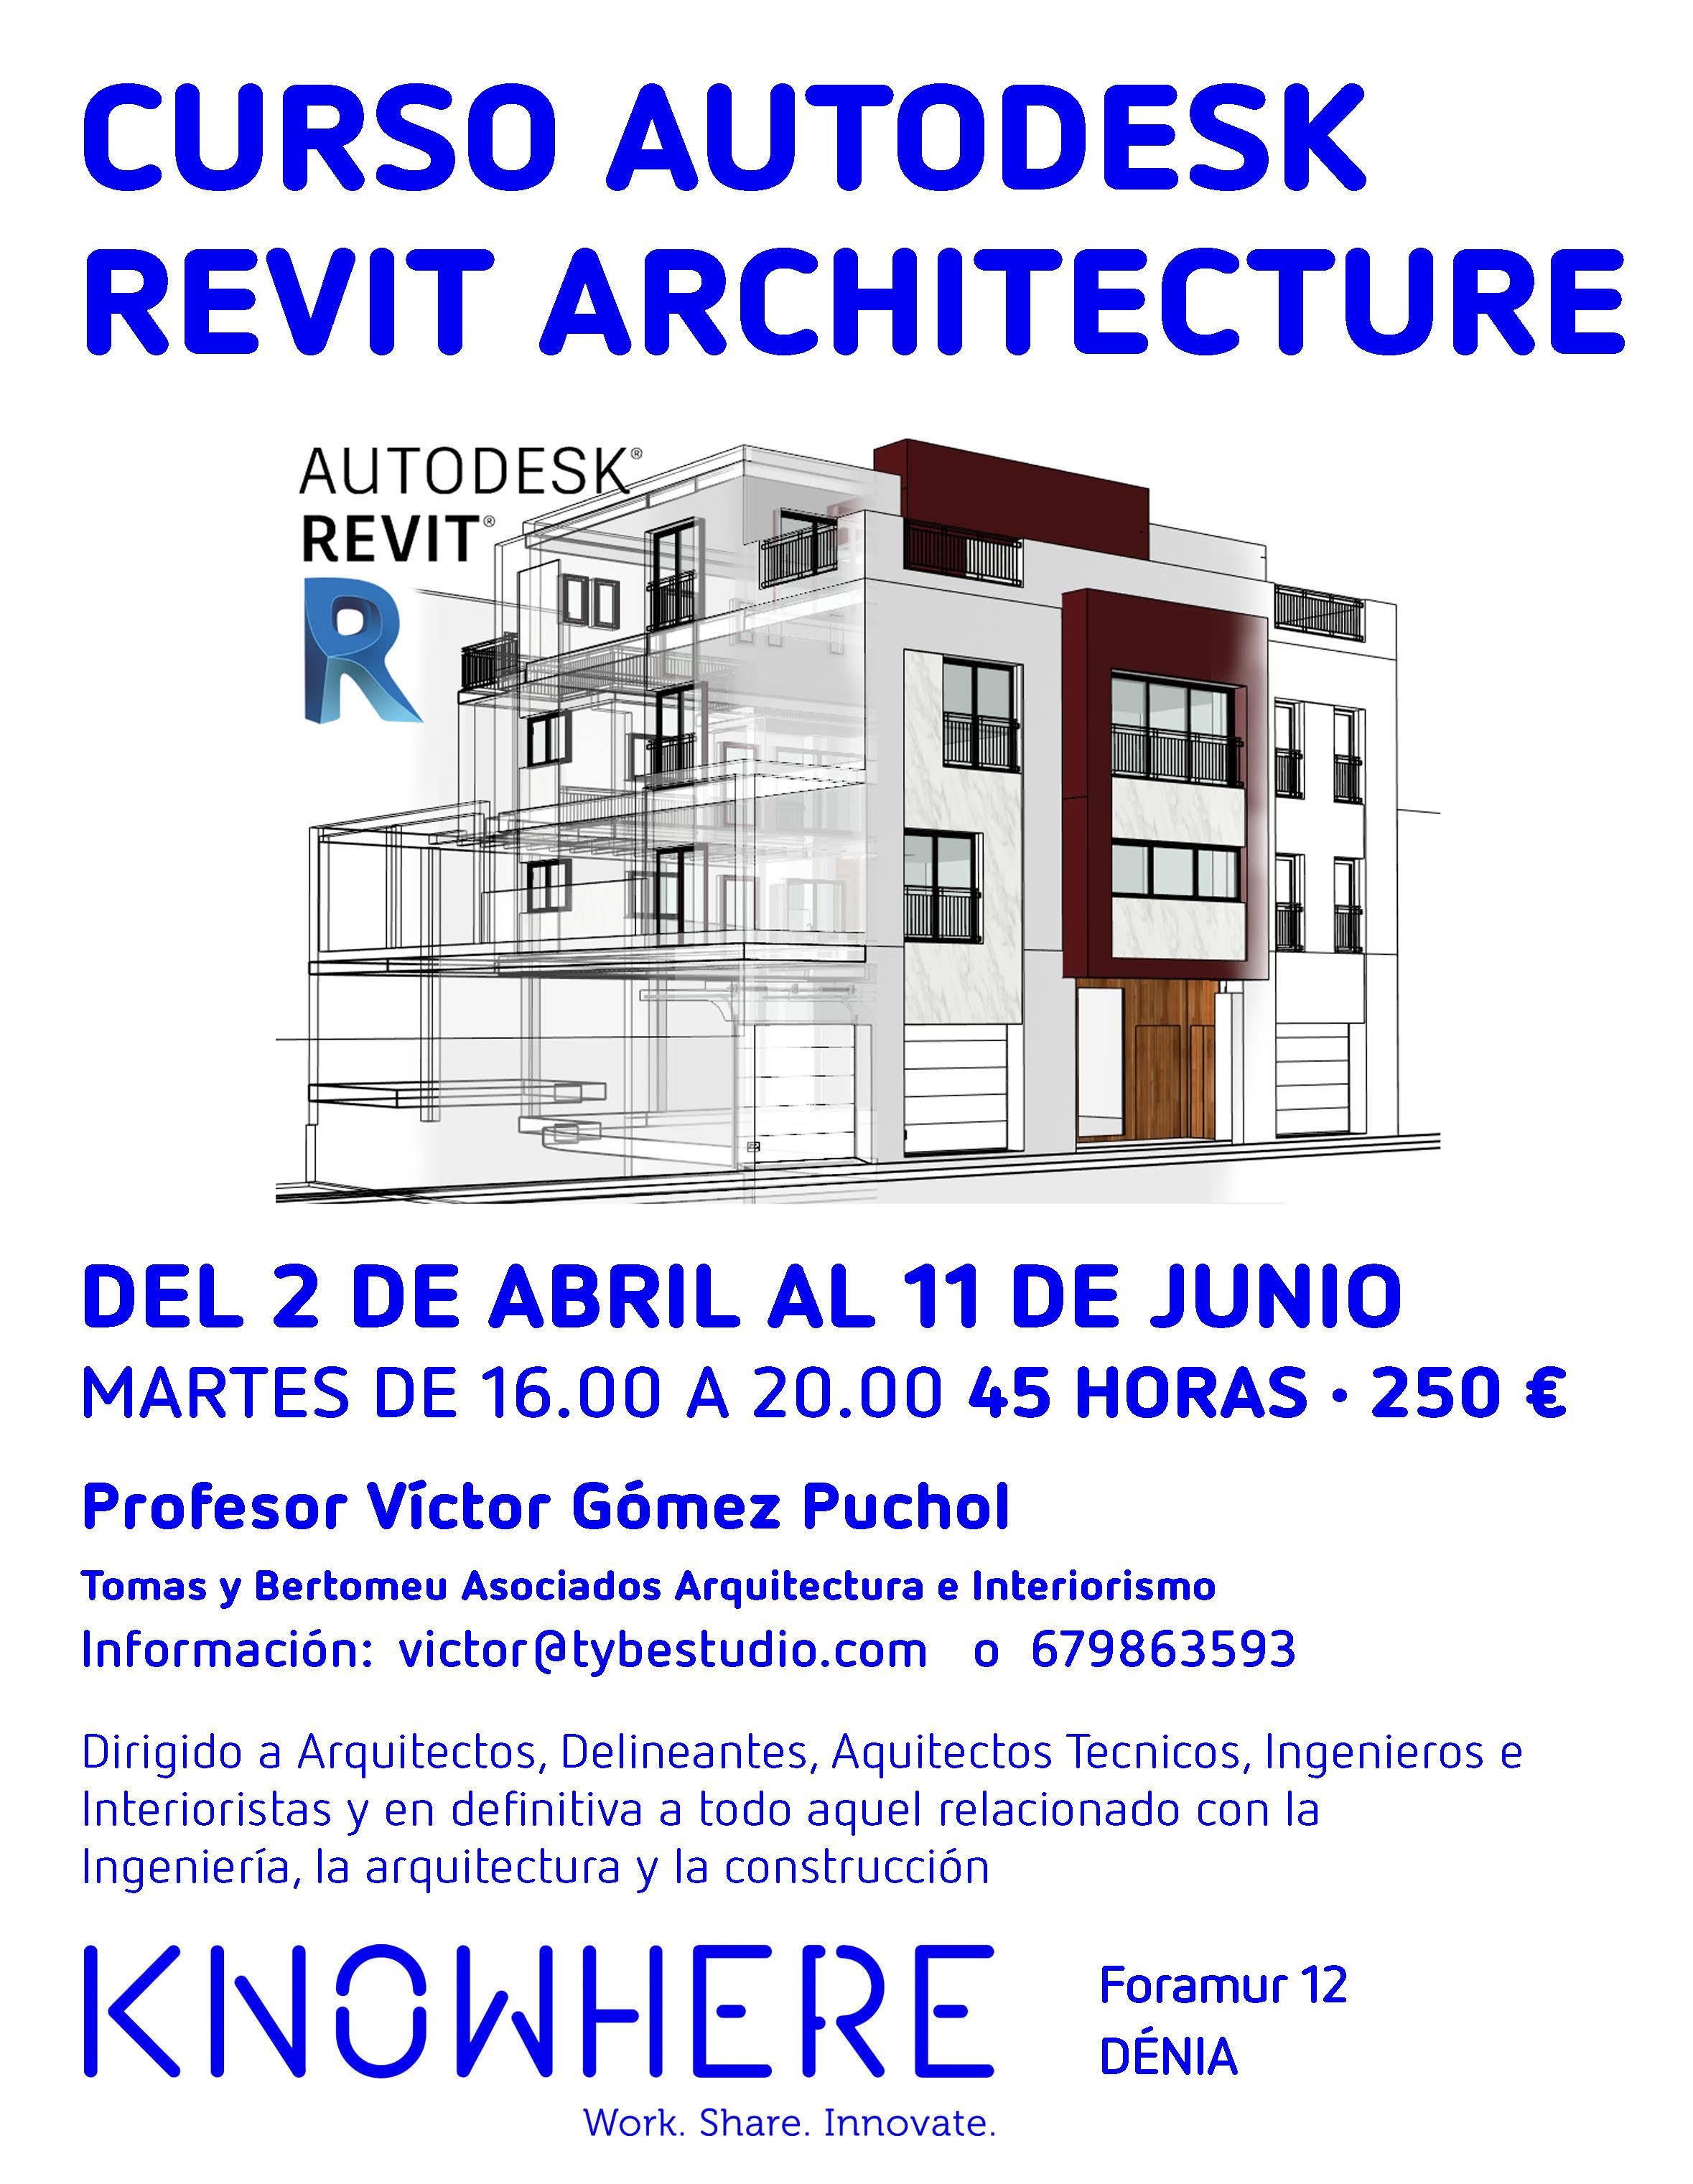 Curso Autodesk Revit Architecture